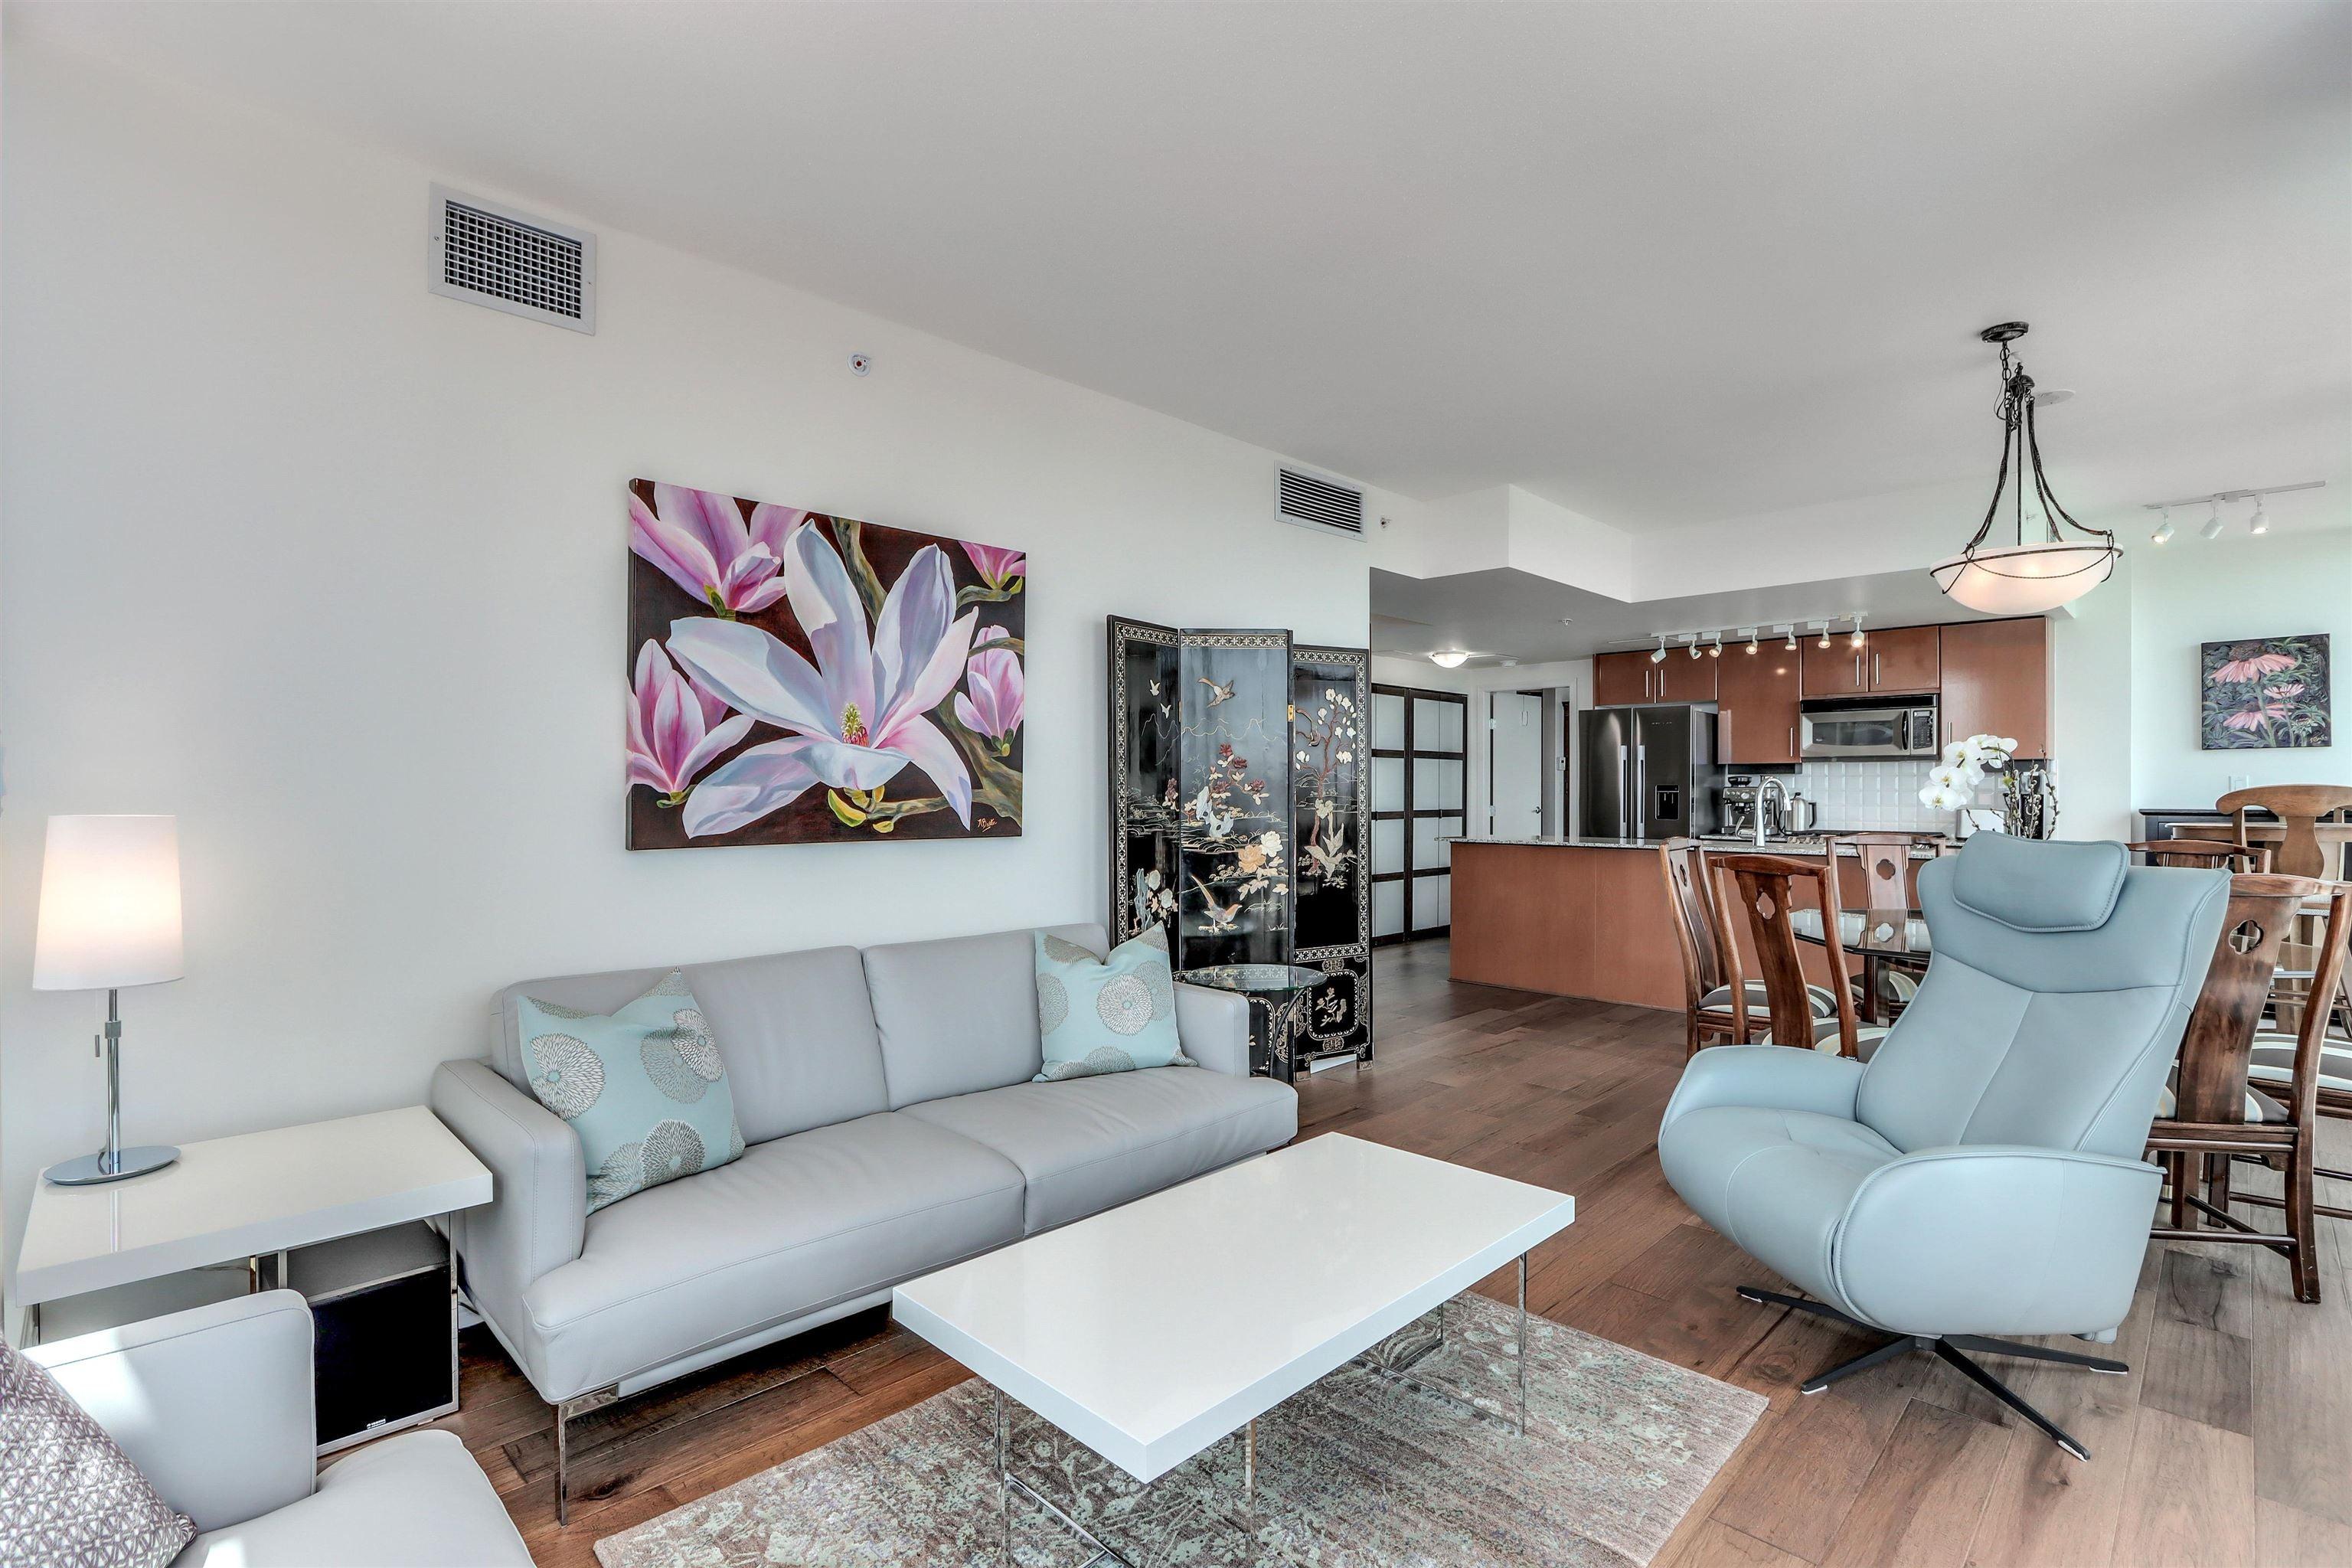 2202 188 E ESPLANADE - Lower Lonsdale Apartment/Condo for sale, 2 Bedrooms (R2618412) - #8